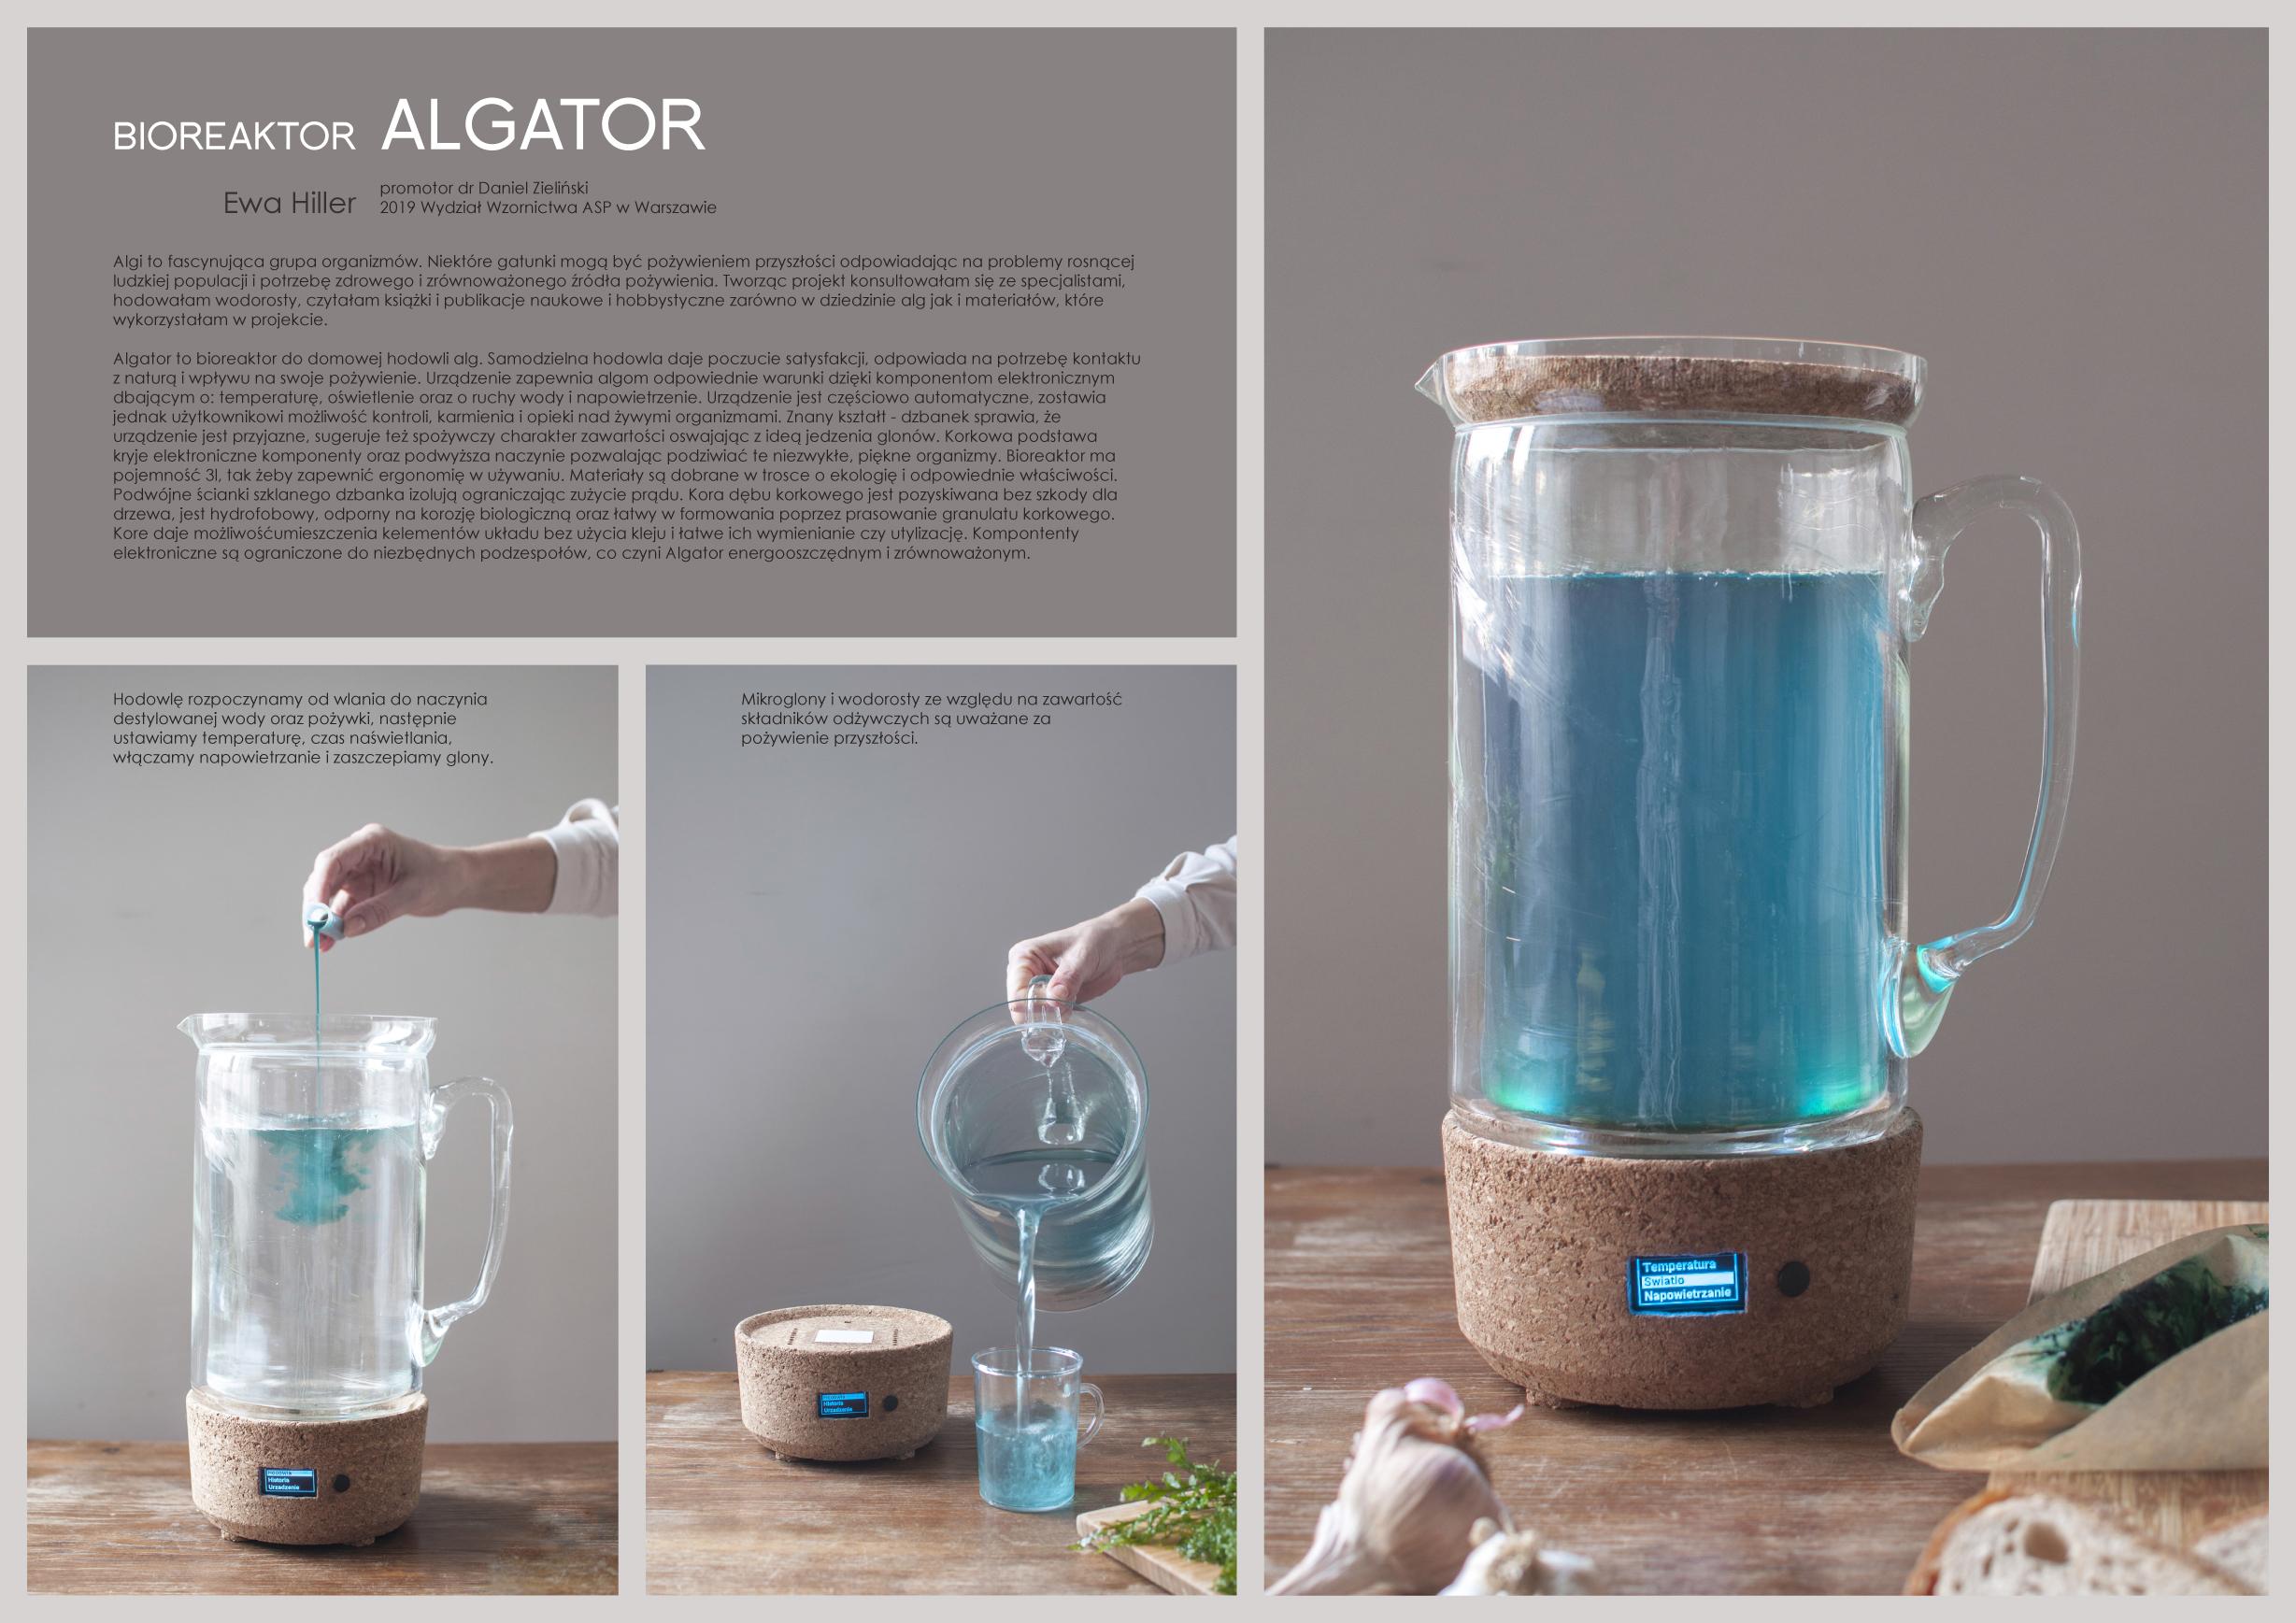 Bioreaktor Algator